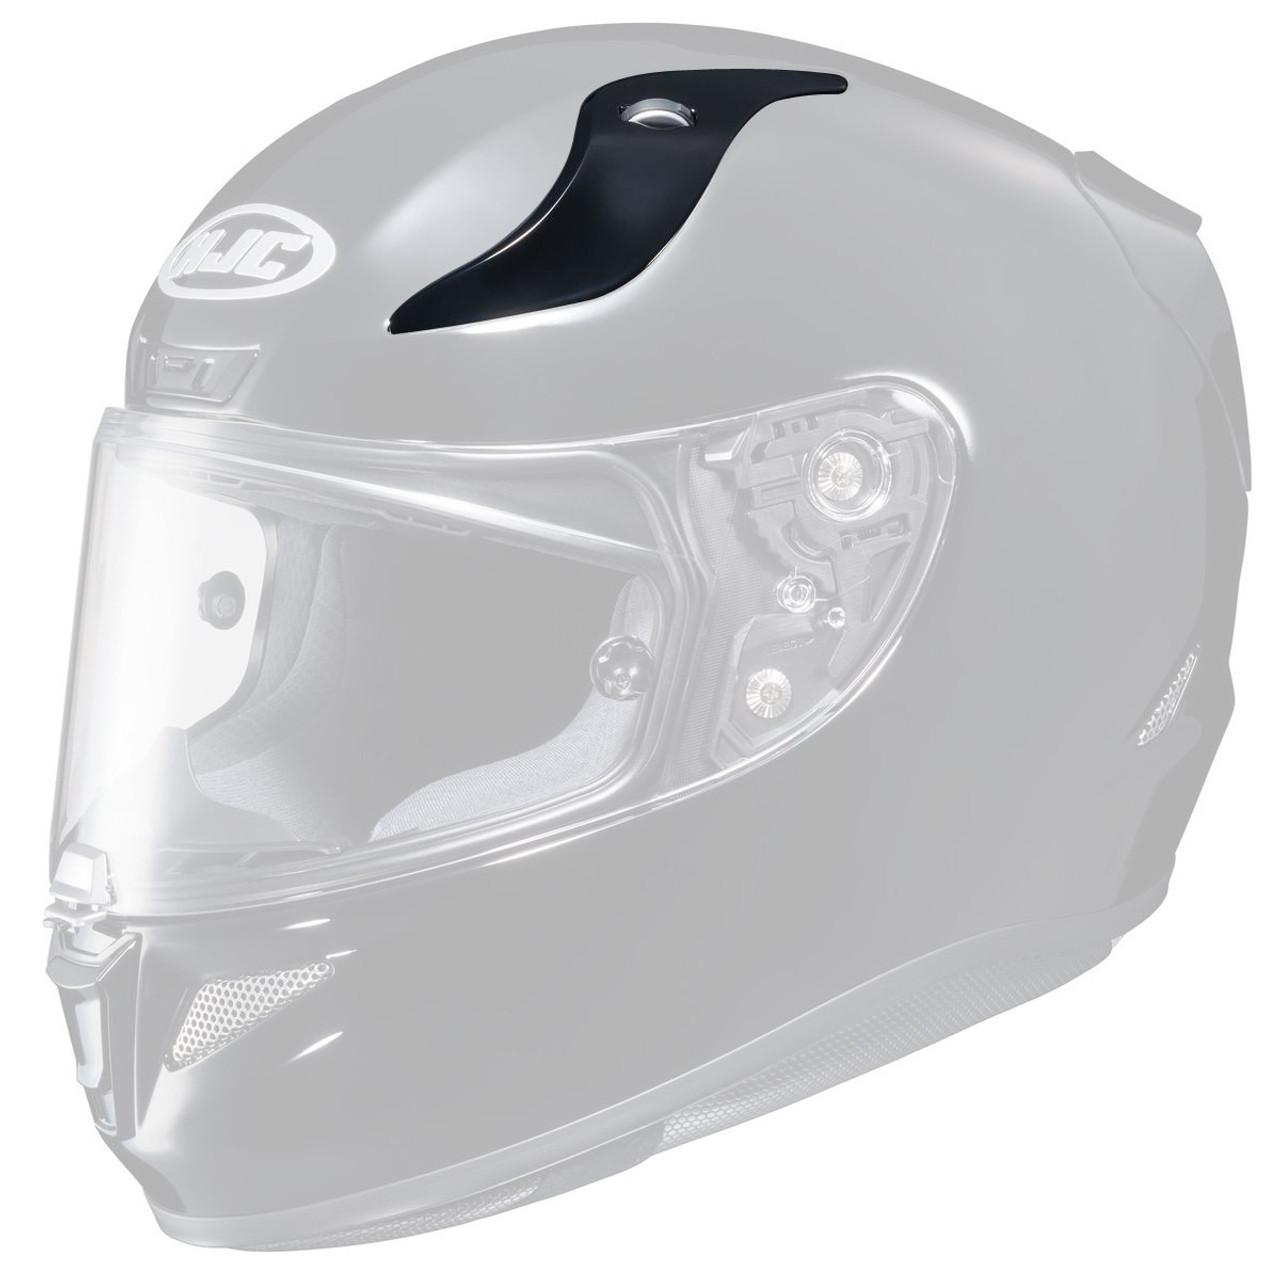 HJC RPHA-11 Pro Helmet Top Vent - Team Motorcycle